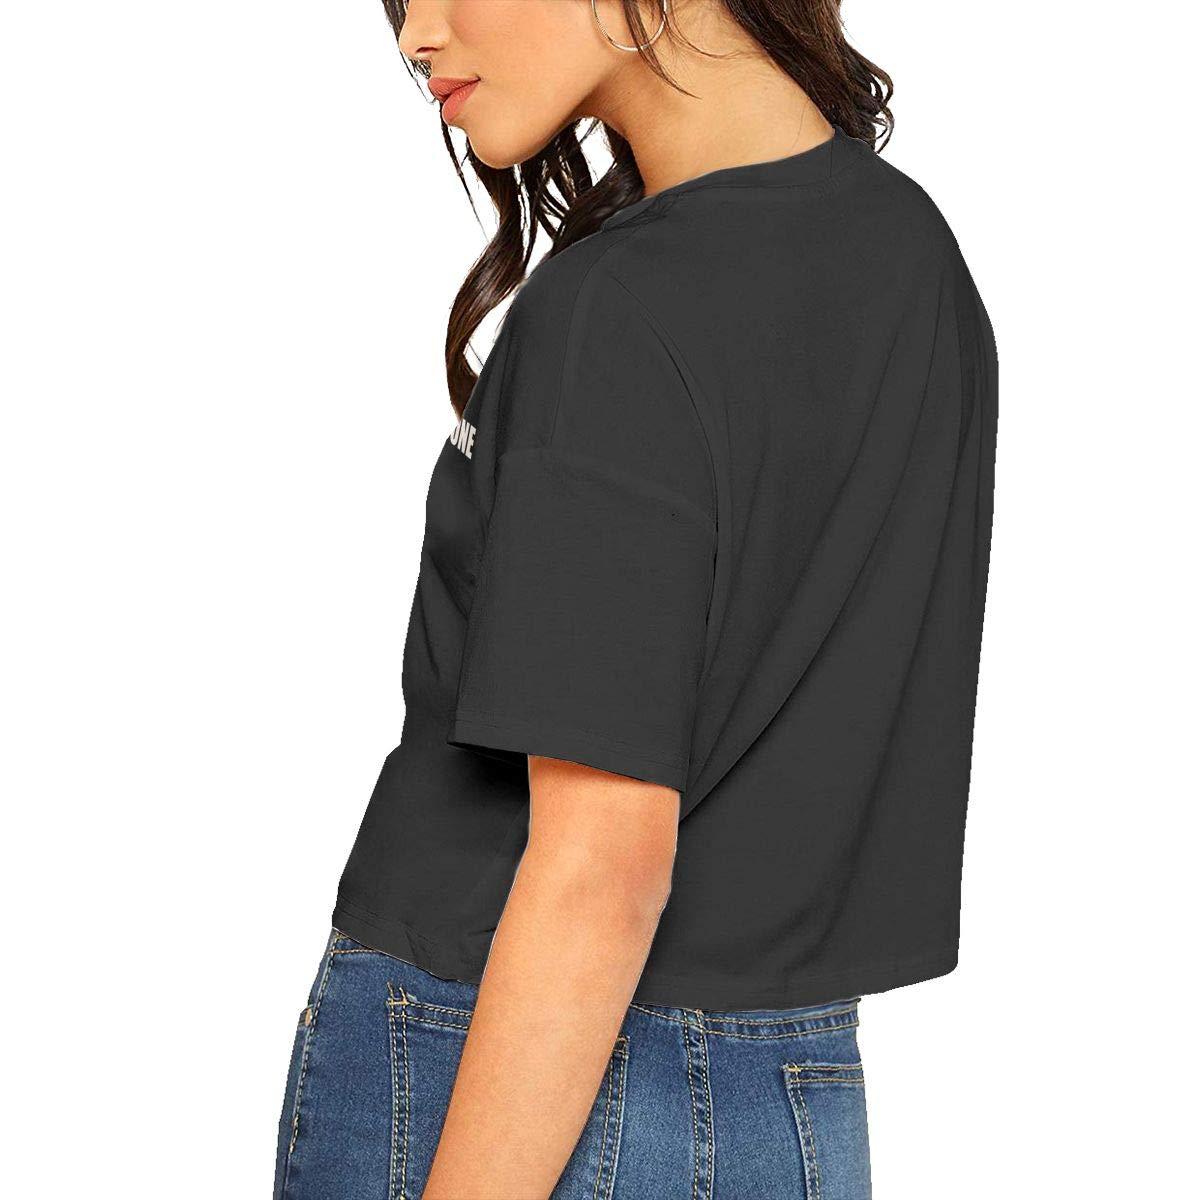 Chouven Women Crop Tops Dont Rust Anyone Round Neck Short Sleeve T-Shirt